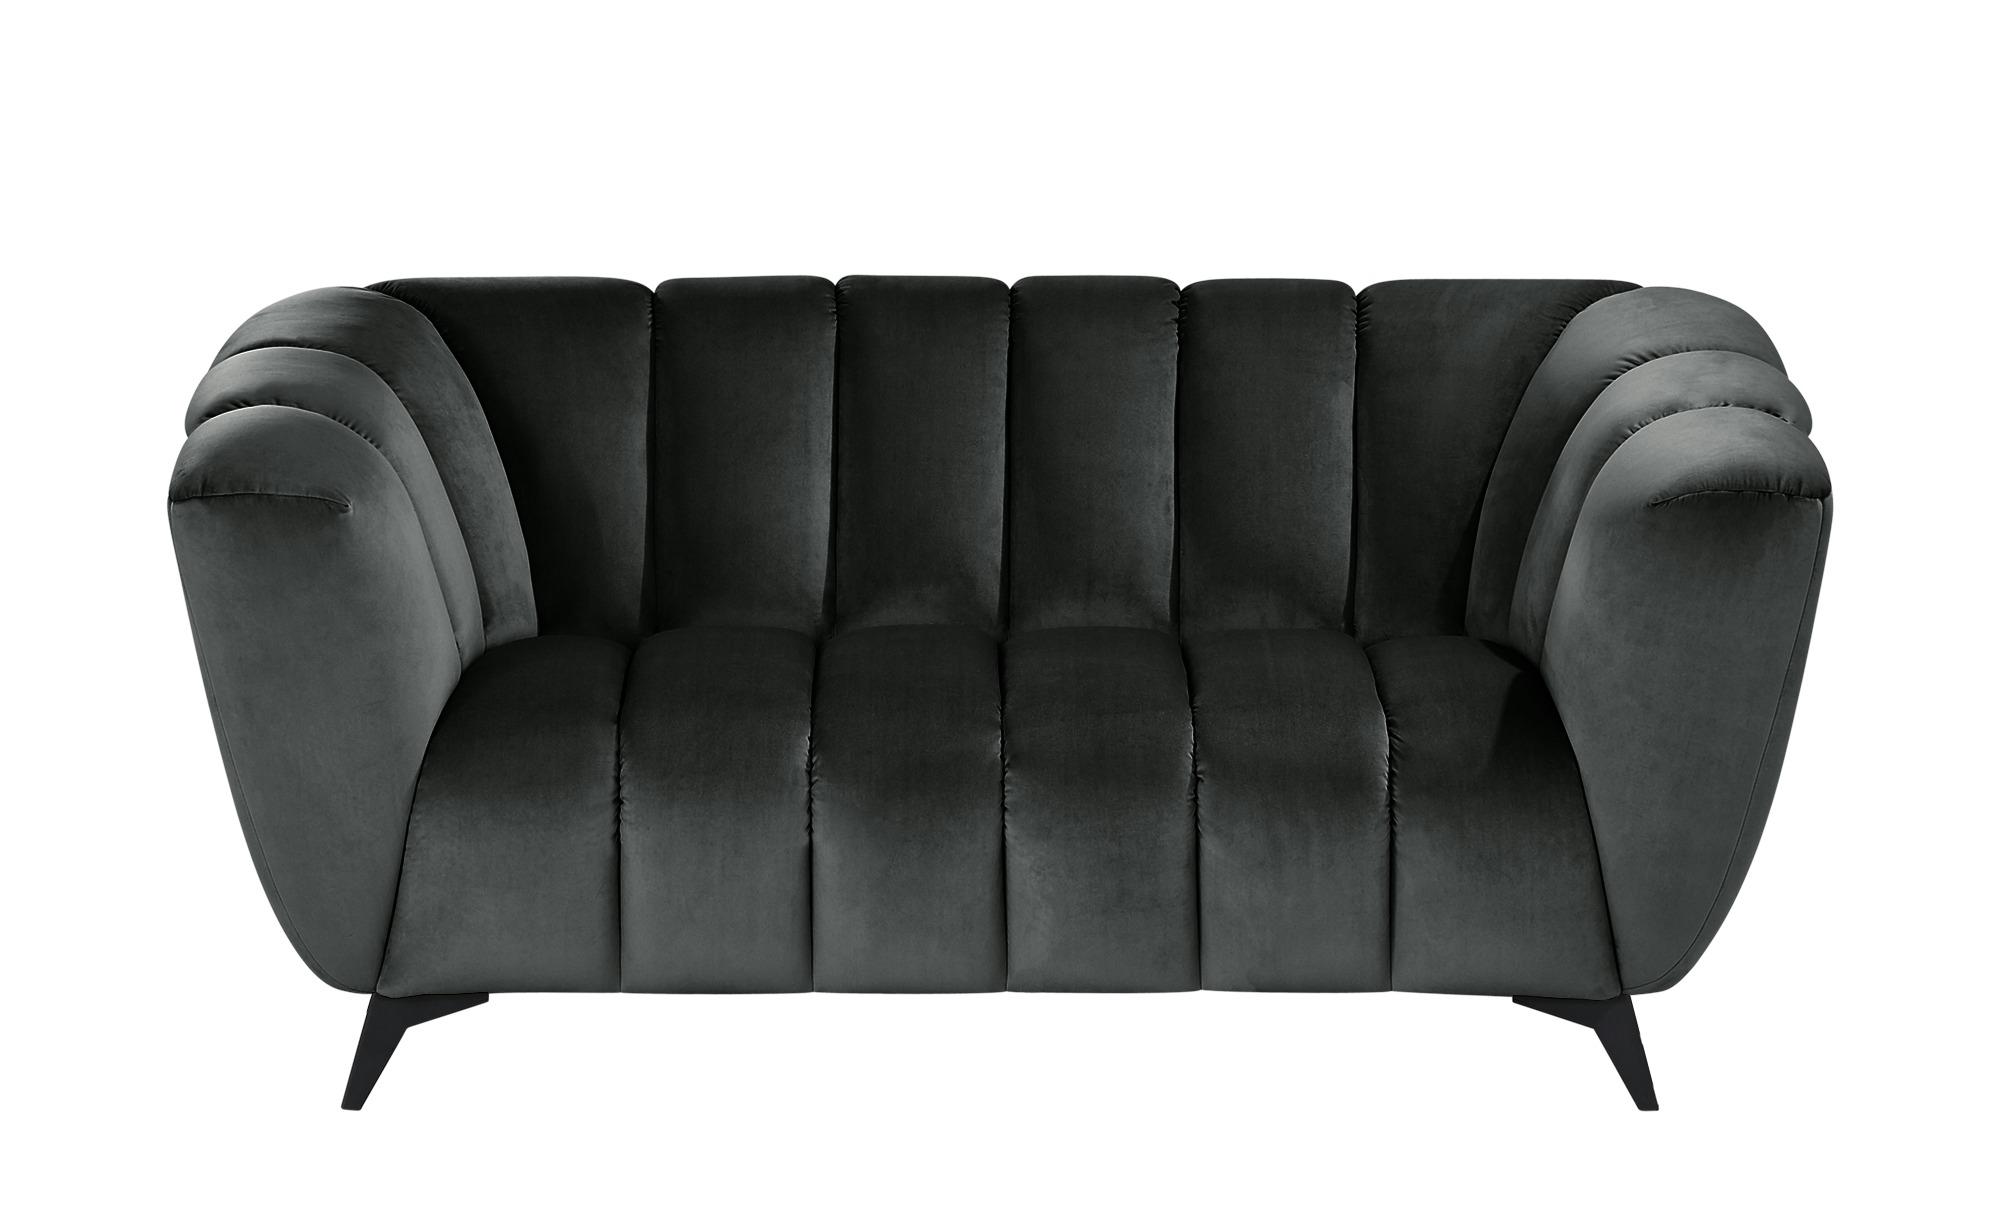 Sofa  Samantha ¦ grau ¦ Maße (cm): B: 180 H: 86 T: 100 Polstermöbel > Sofas > 2-Sitzer - Höffner